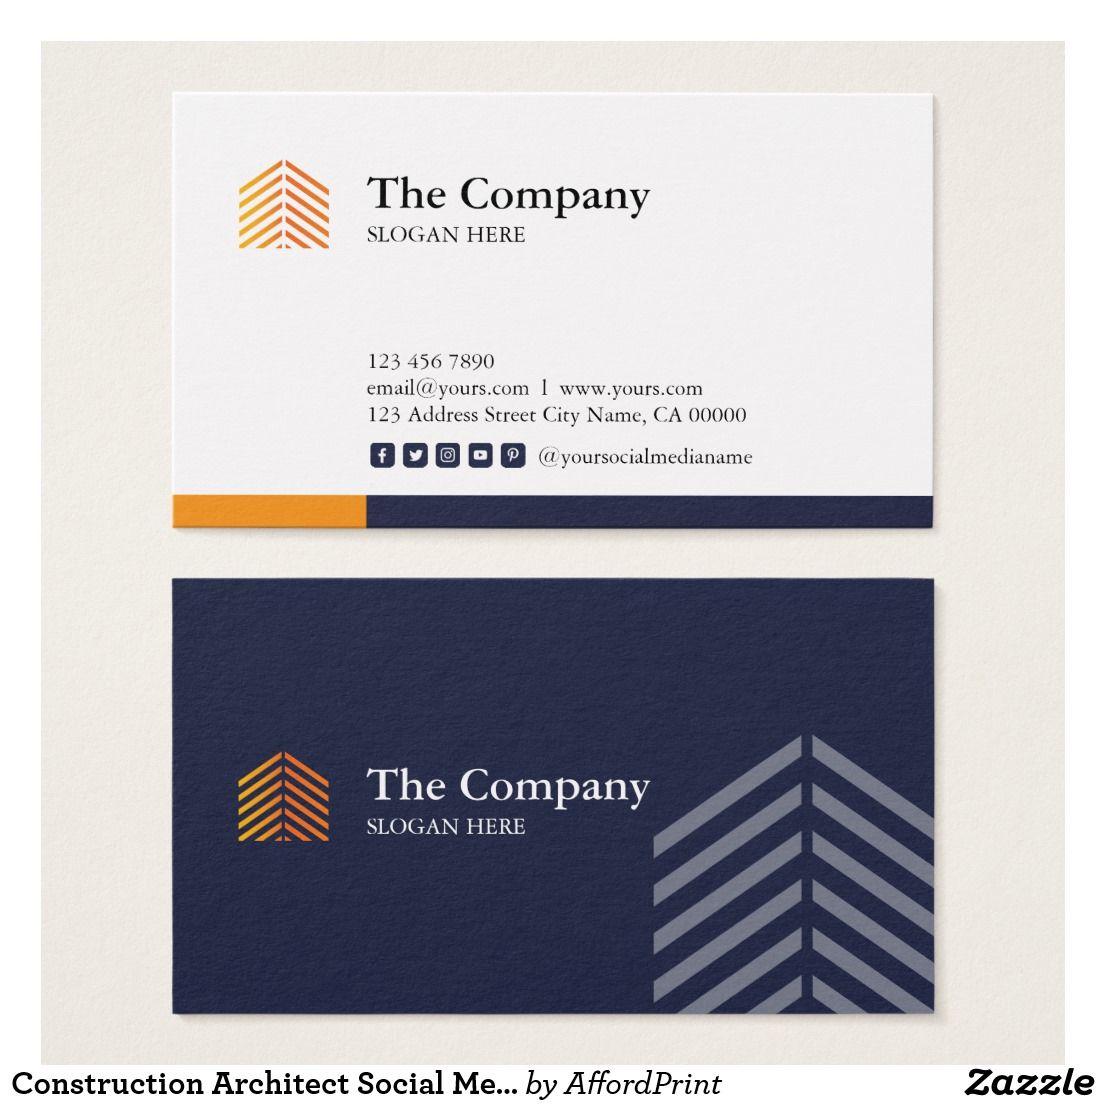 Construction Architect Social Media